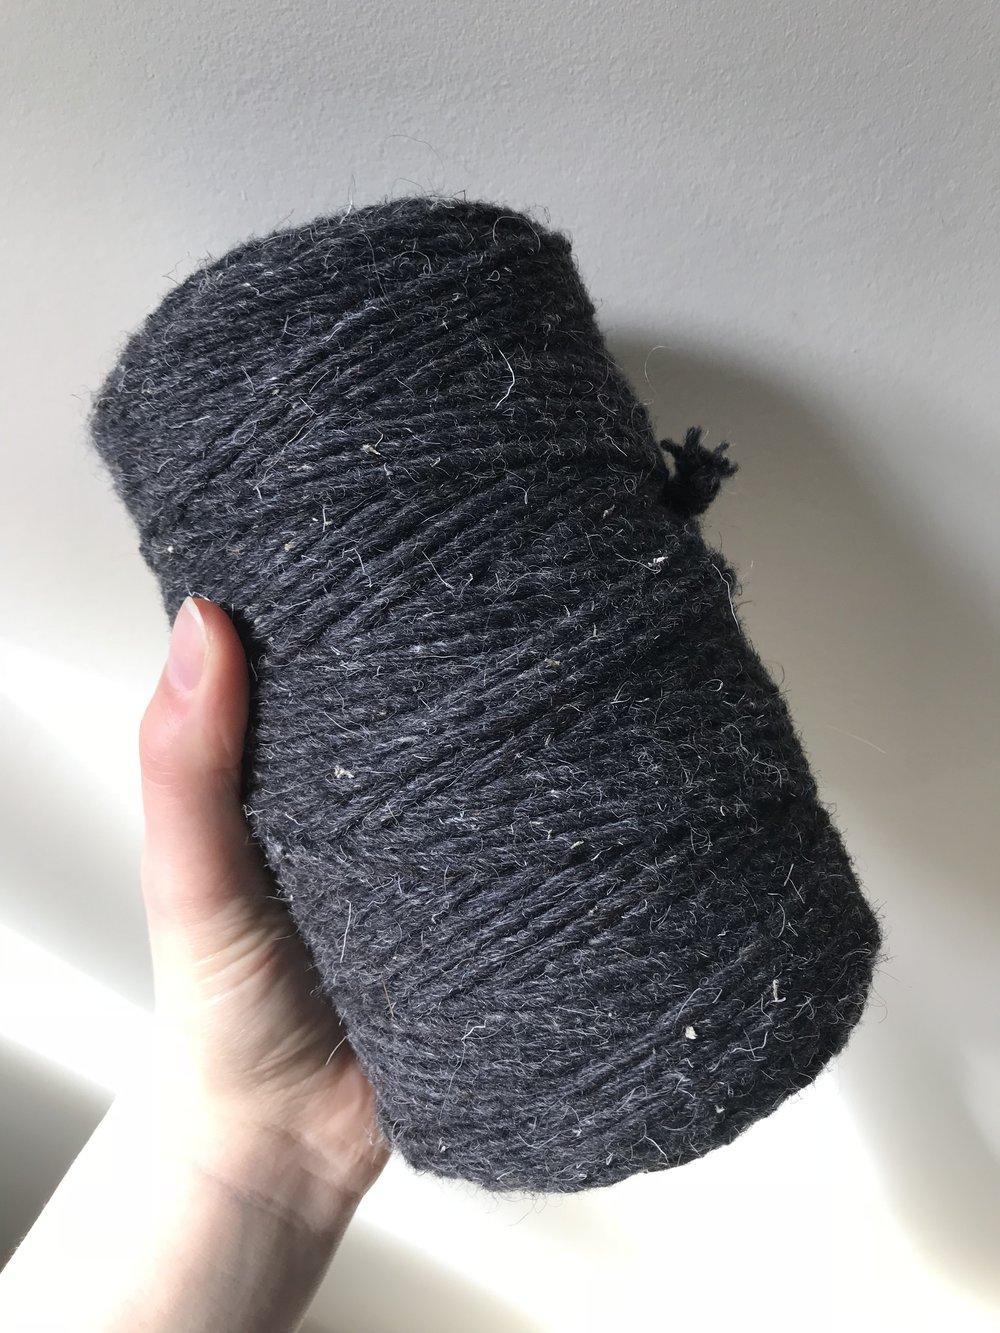 Rug yarn (wool blend)